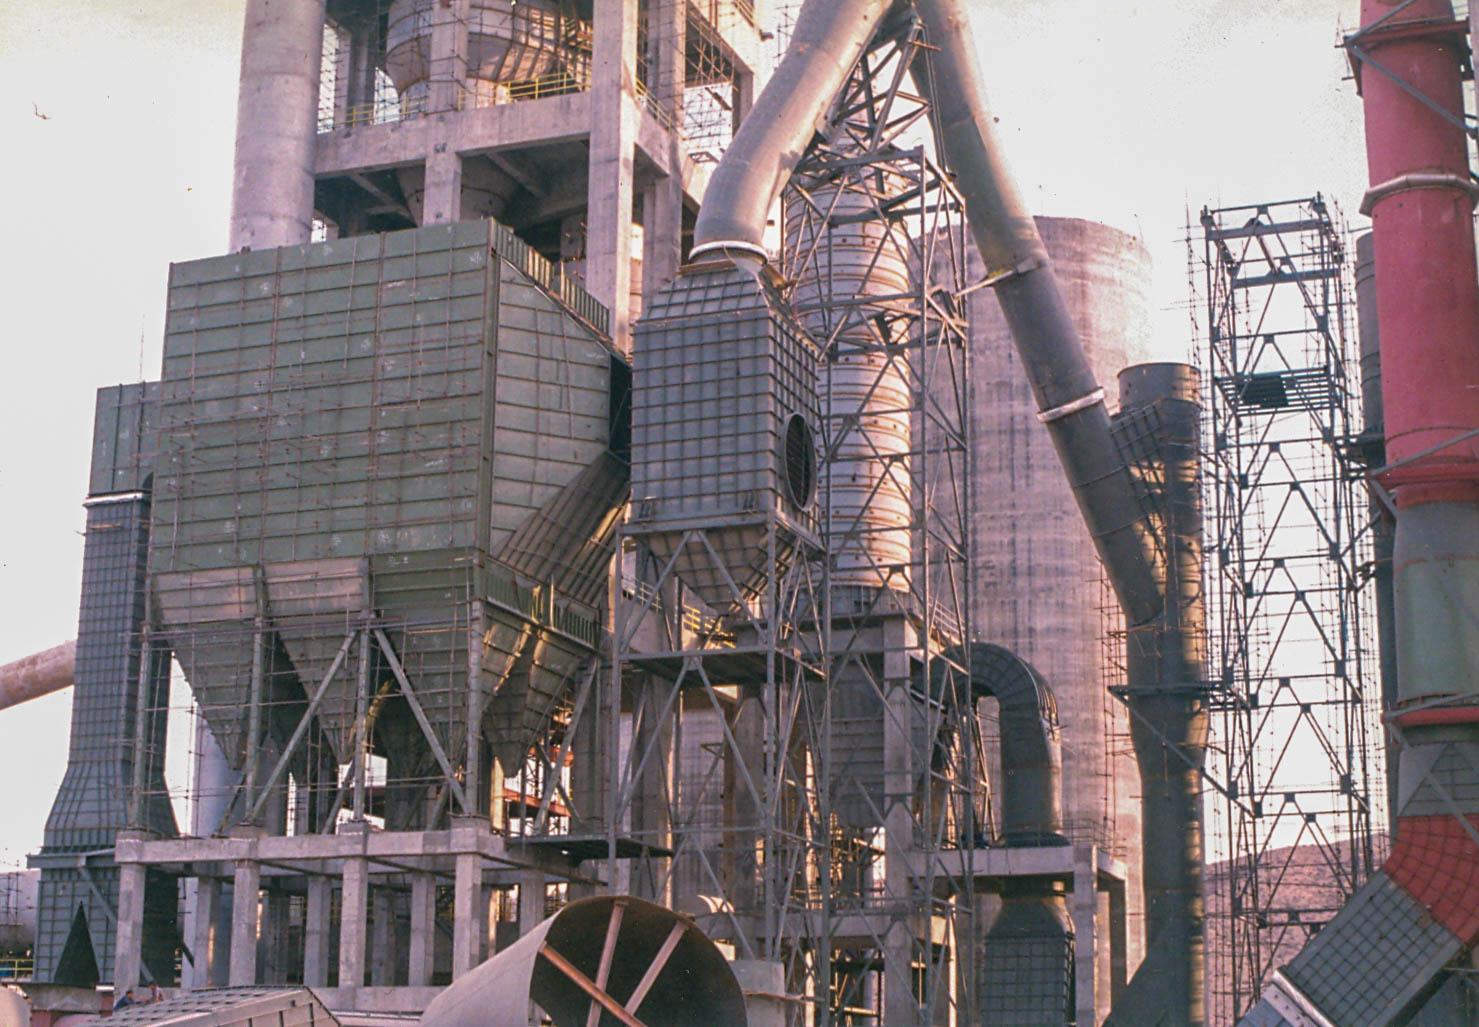 Darab Cement